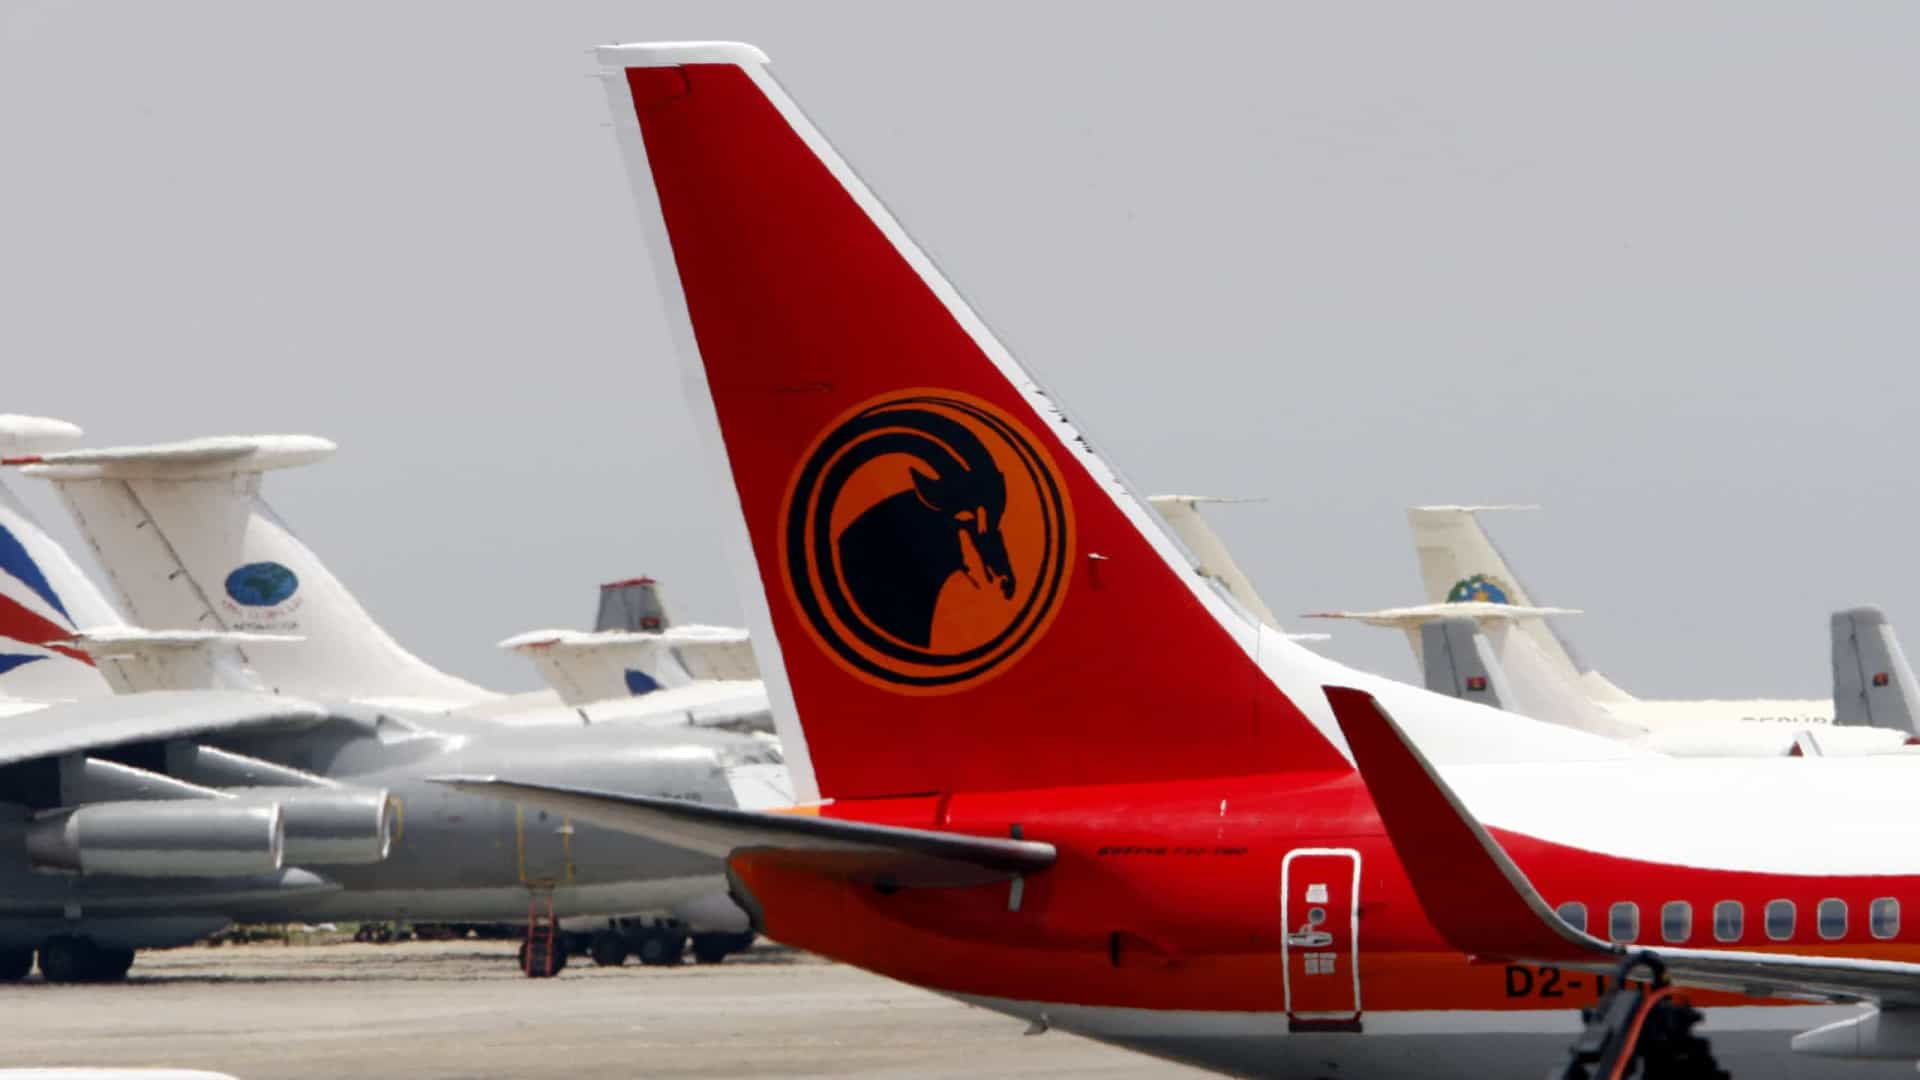 TAAG necessita de novas aeronaves para travar prejuízo